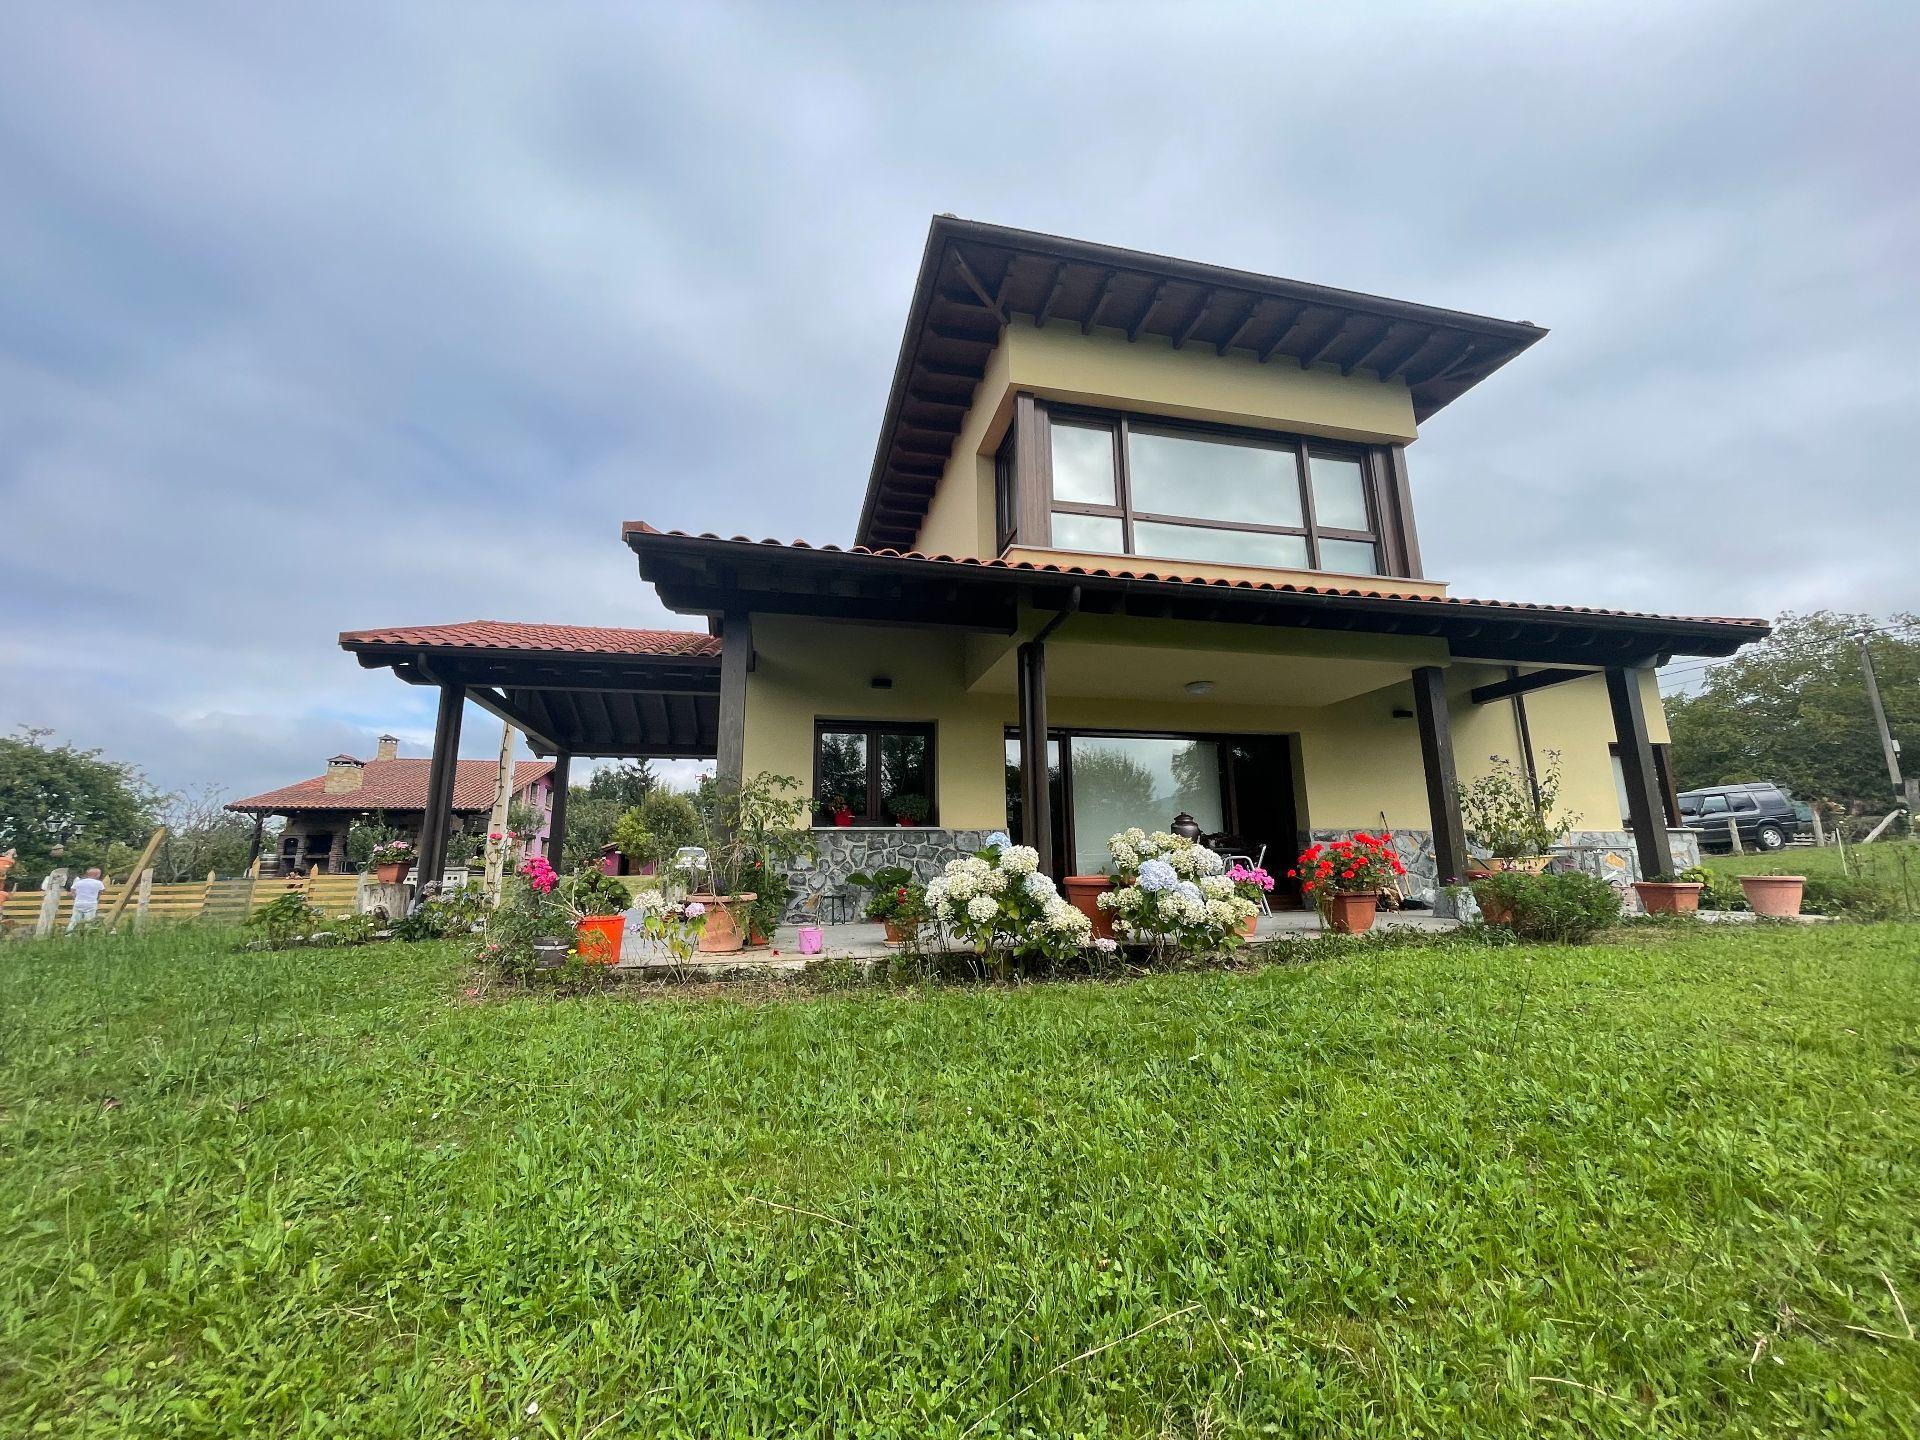 Casa / Chalet en Piloña, CONCEJO DE PILOÑA, venta